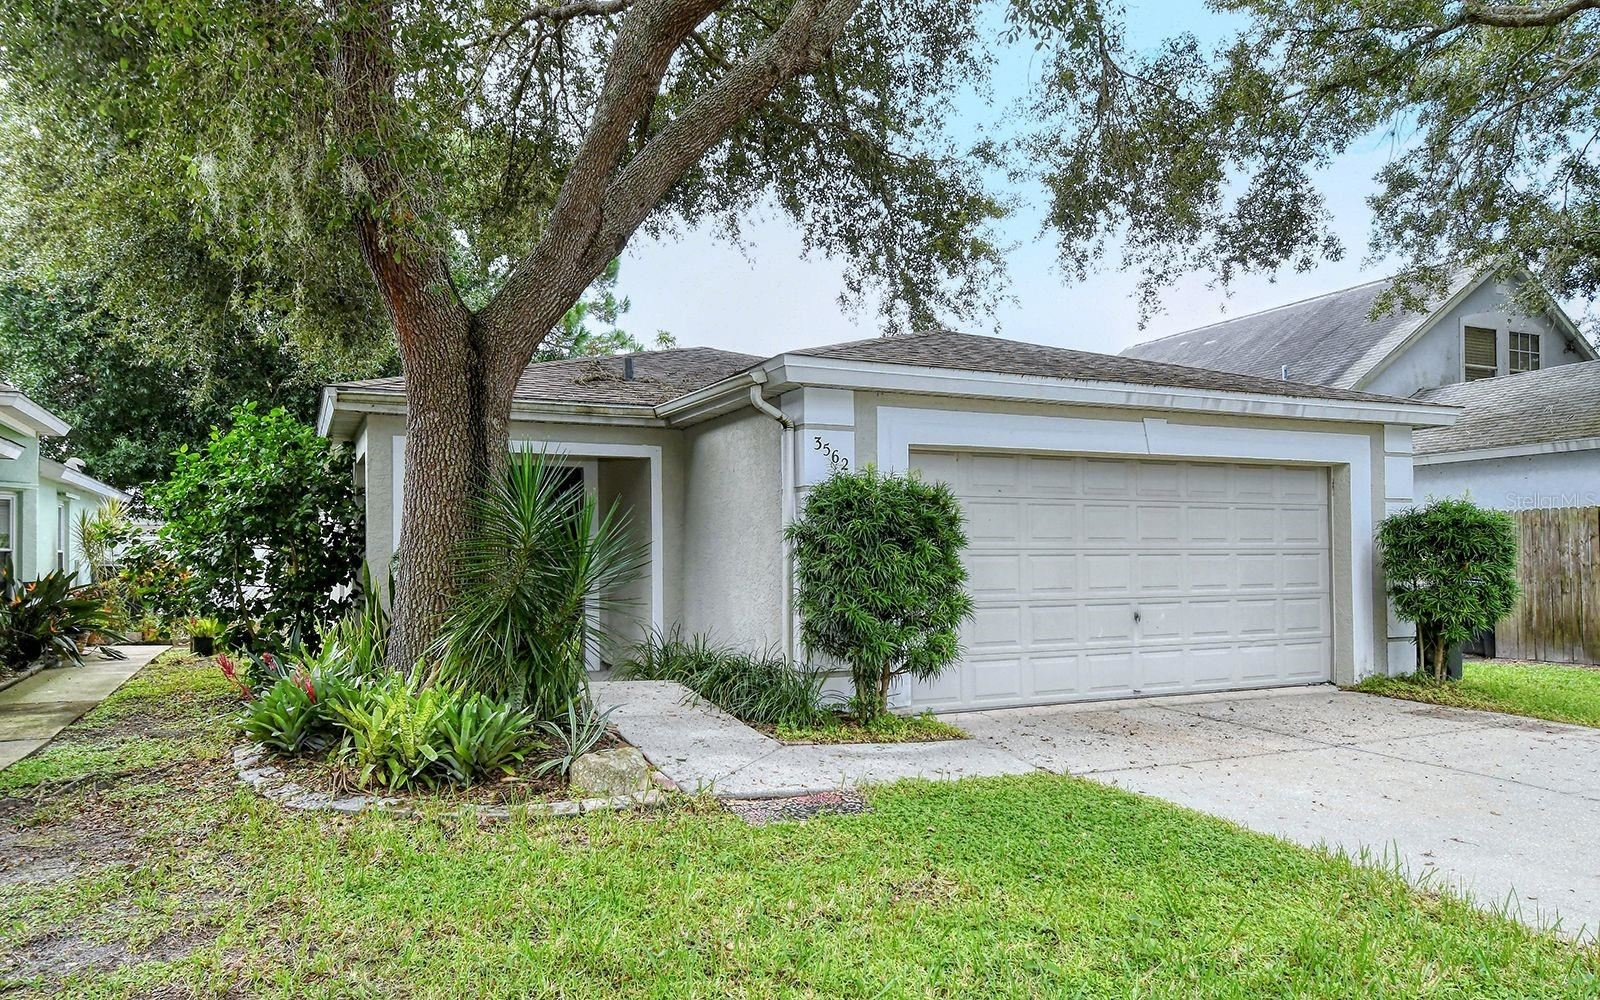 3562 BLECHNUM FERN LANE, Sarasota, FL 34235 - #: A4511939